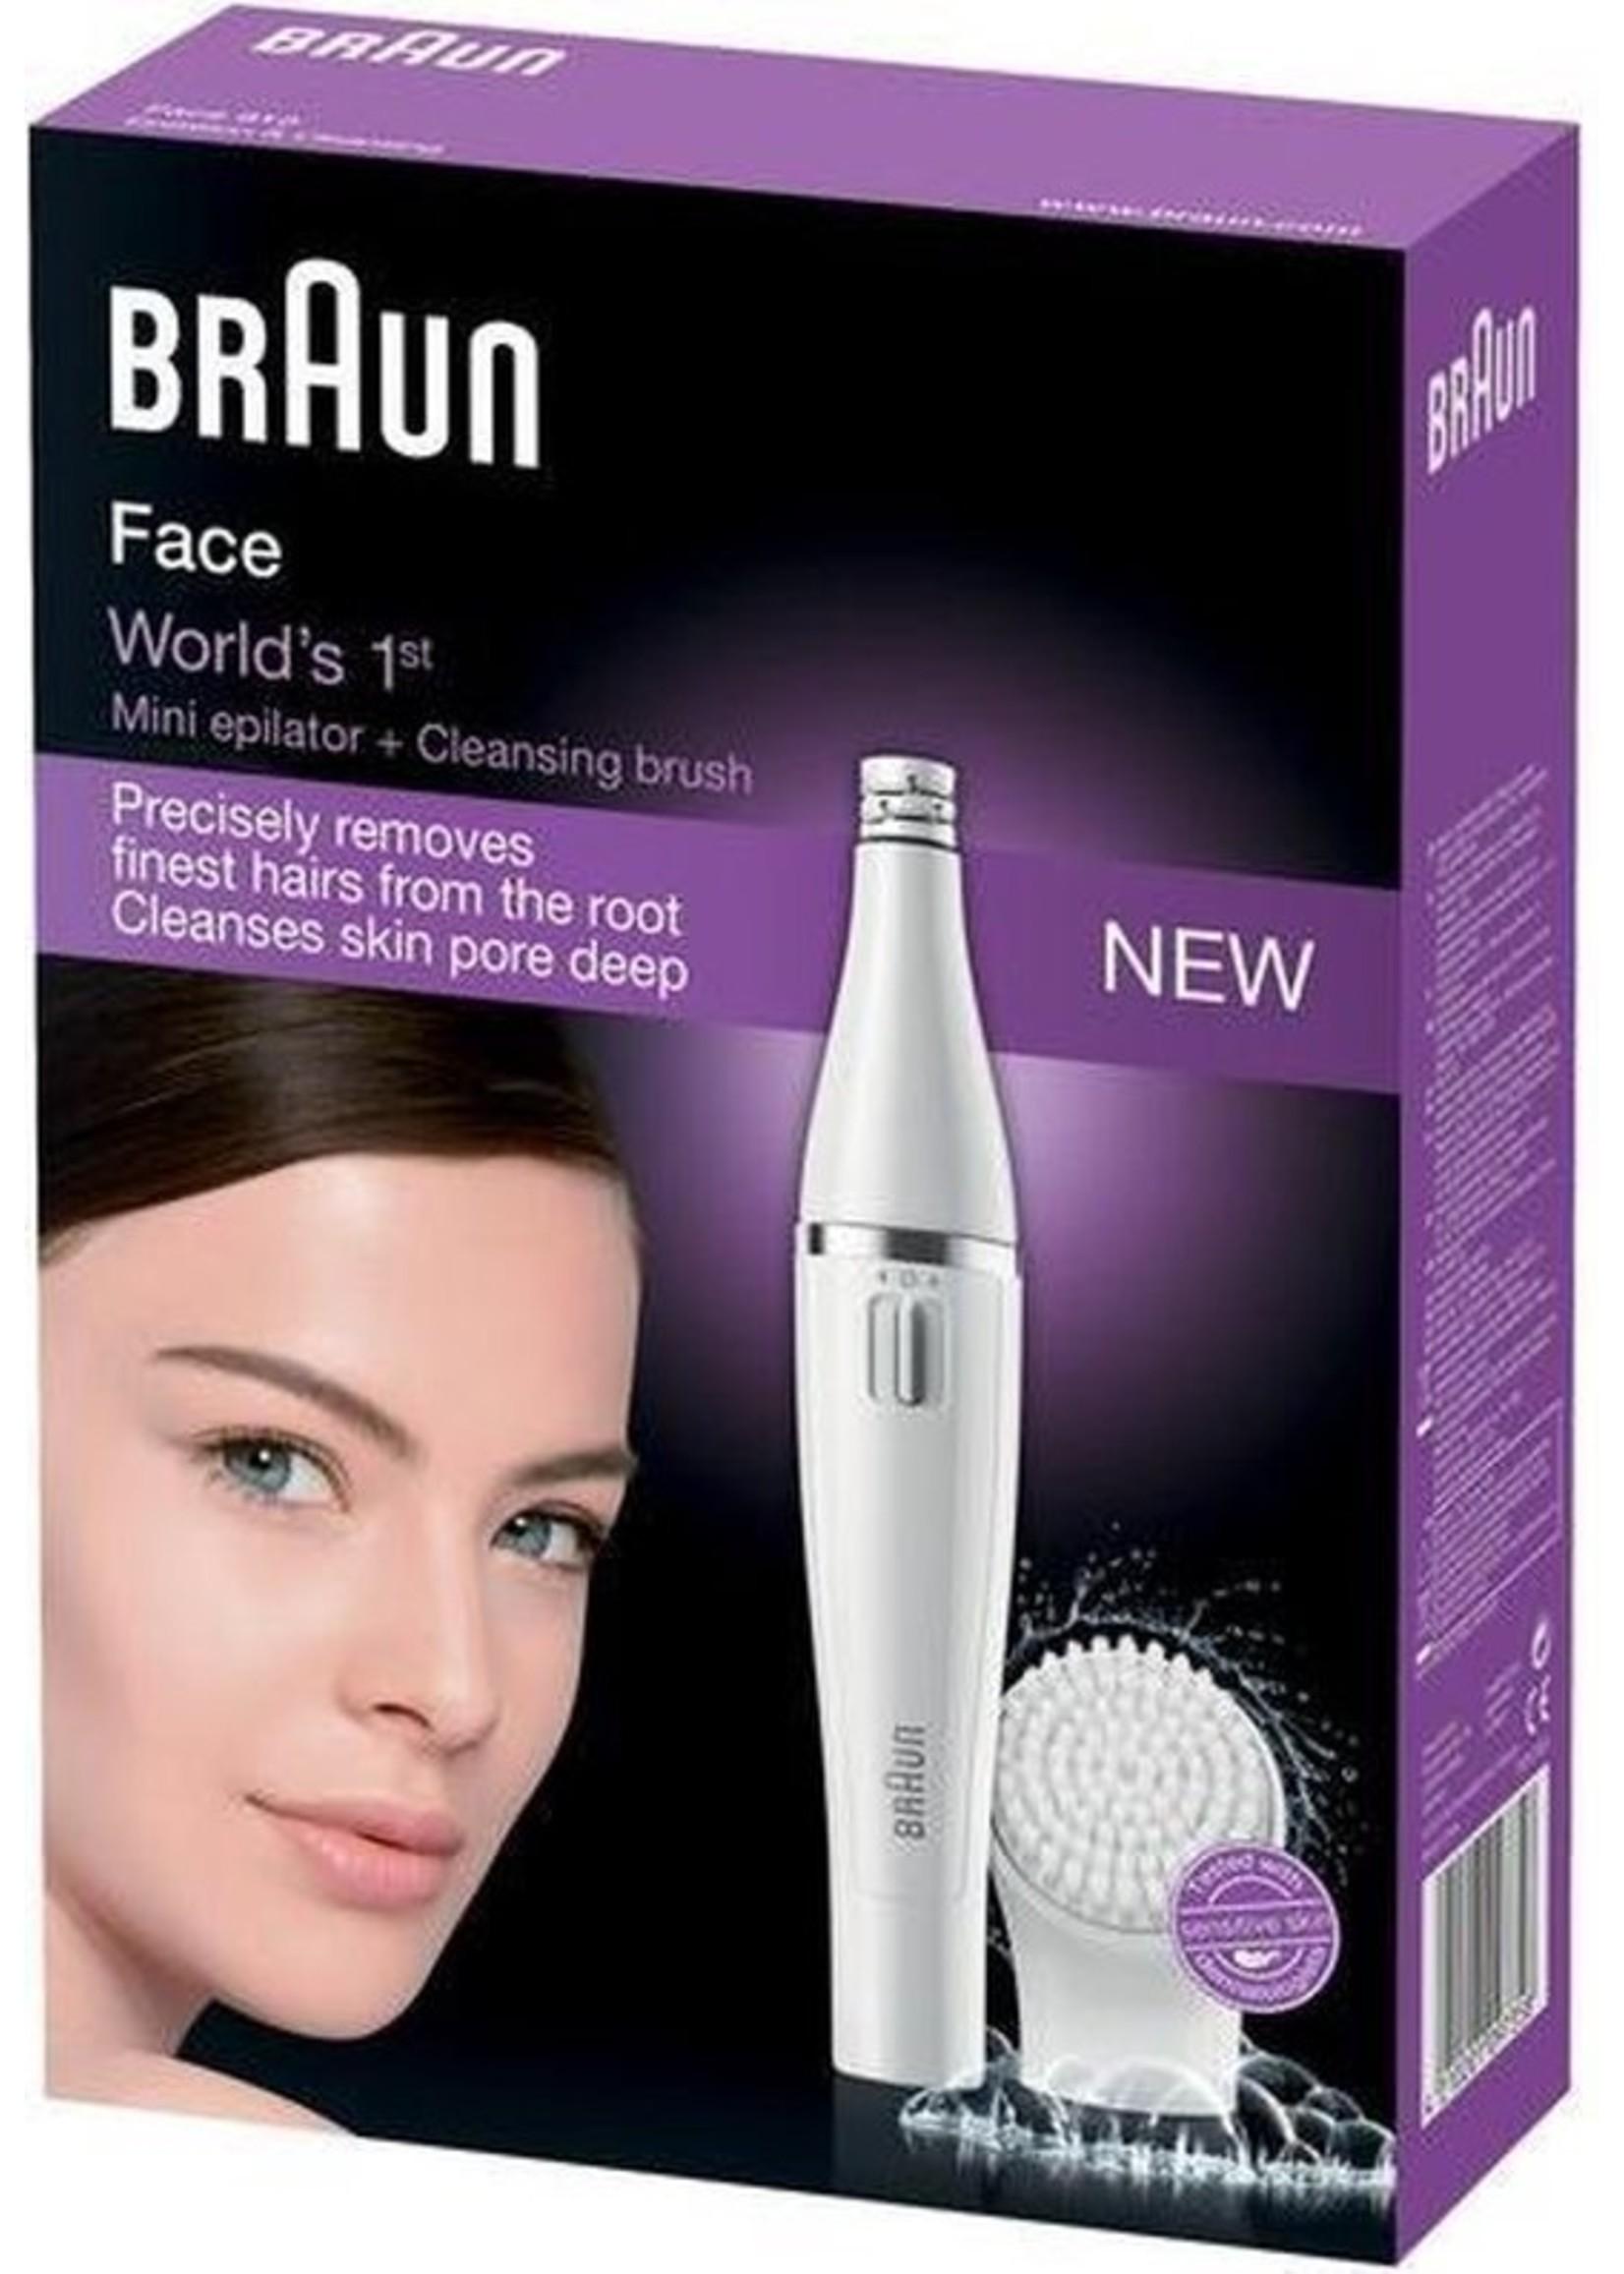 Braun Braun Face SE810 - Epilator Met Gezichtsreinigingsborstel